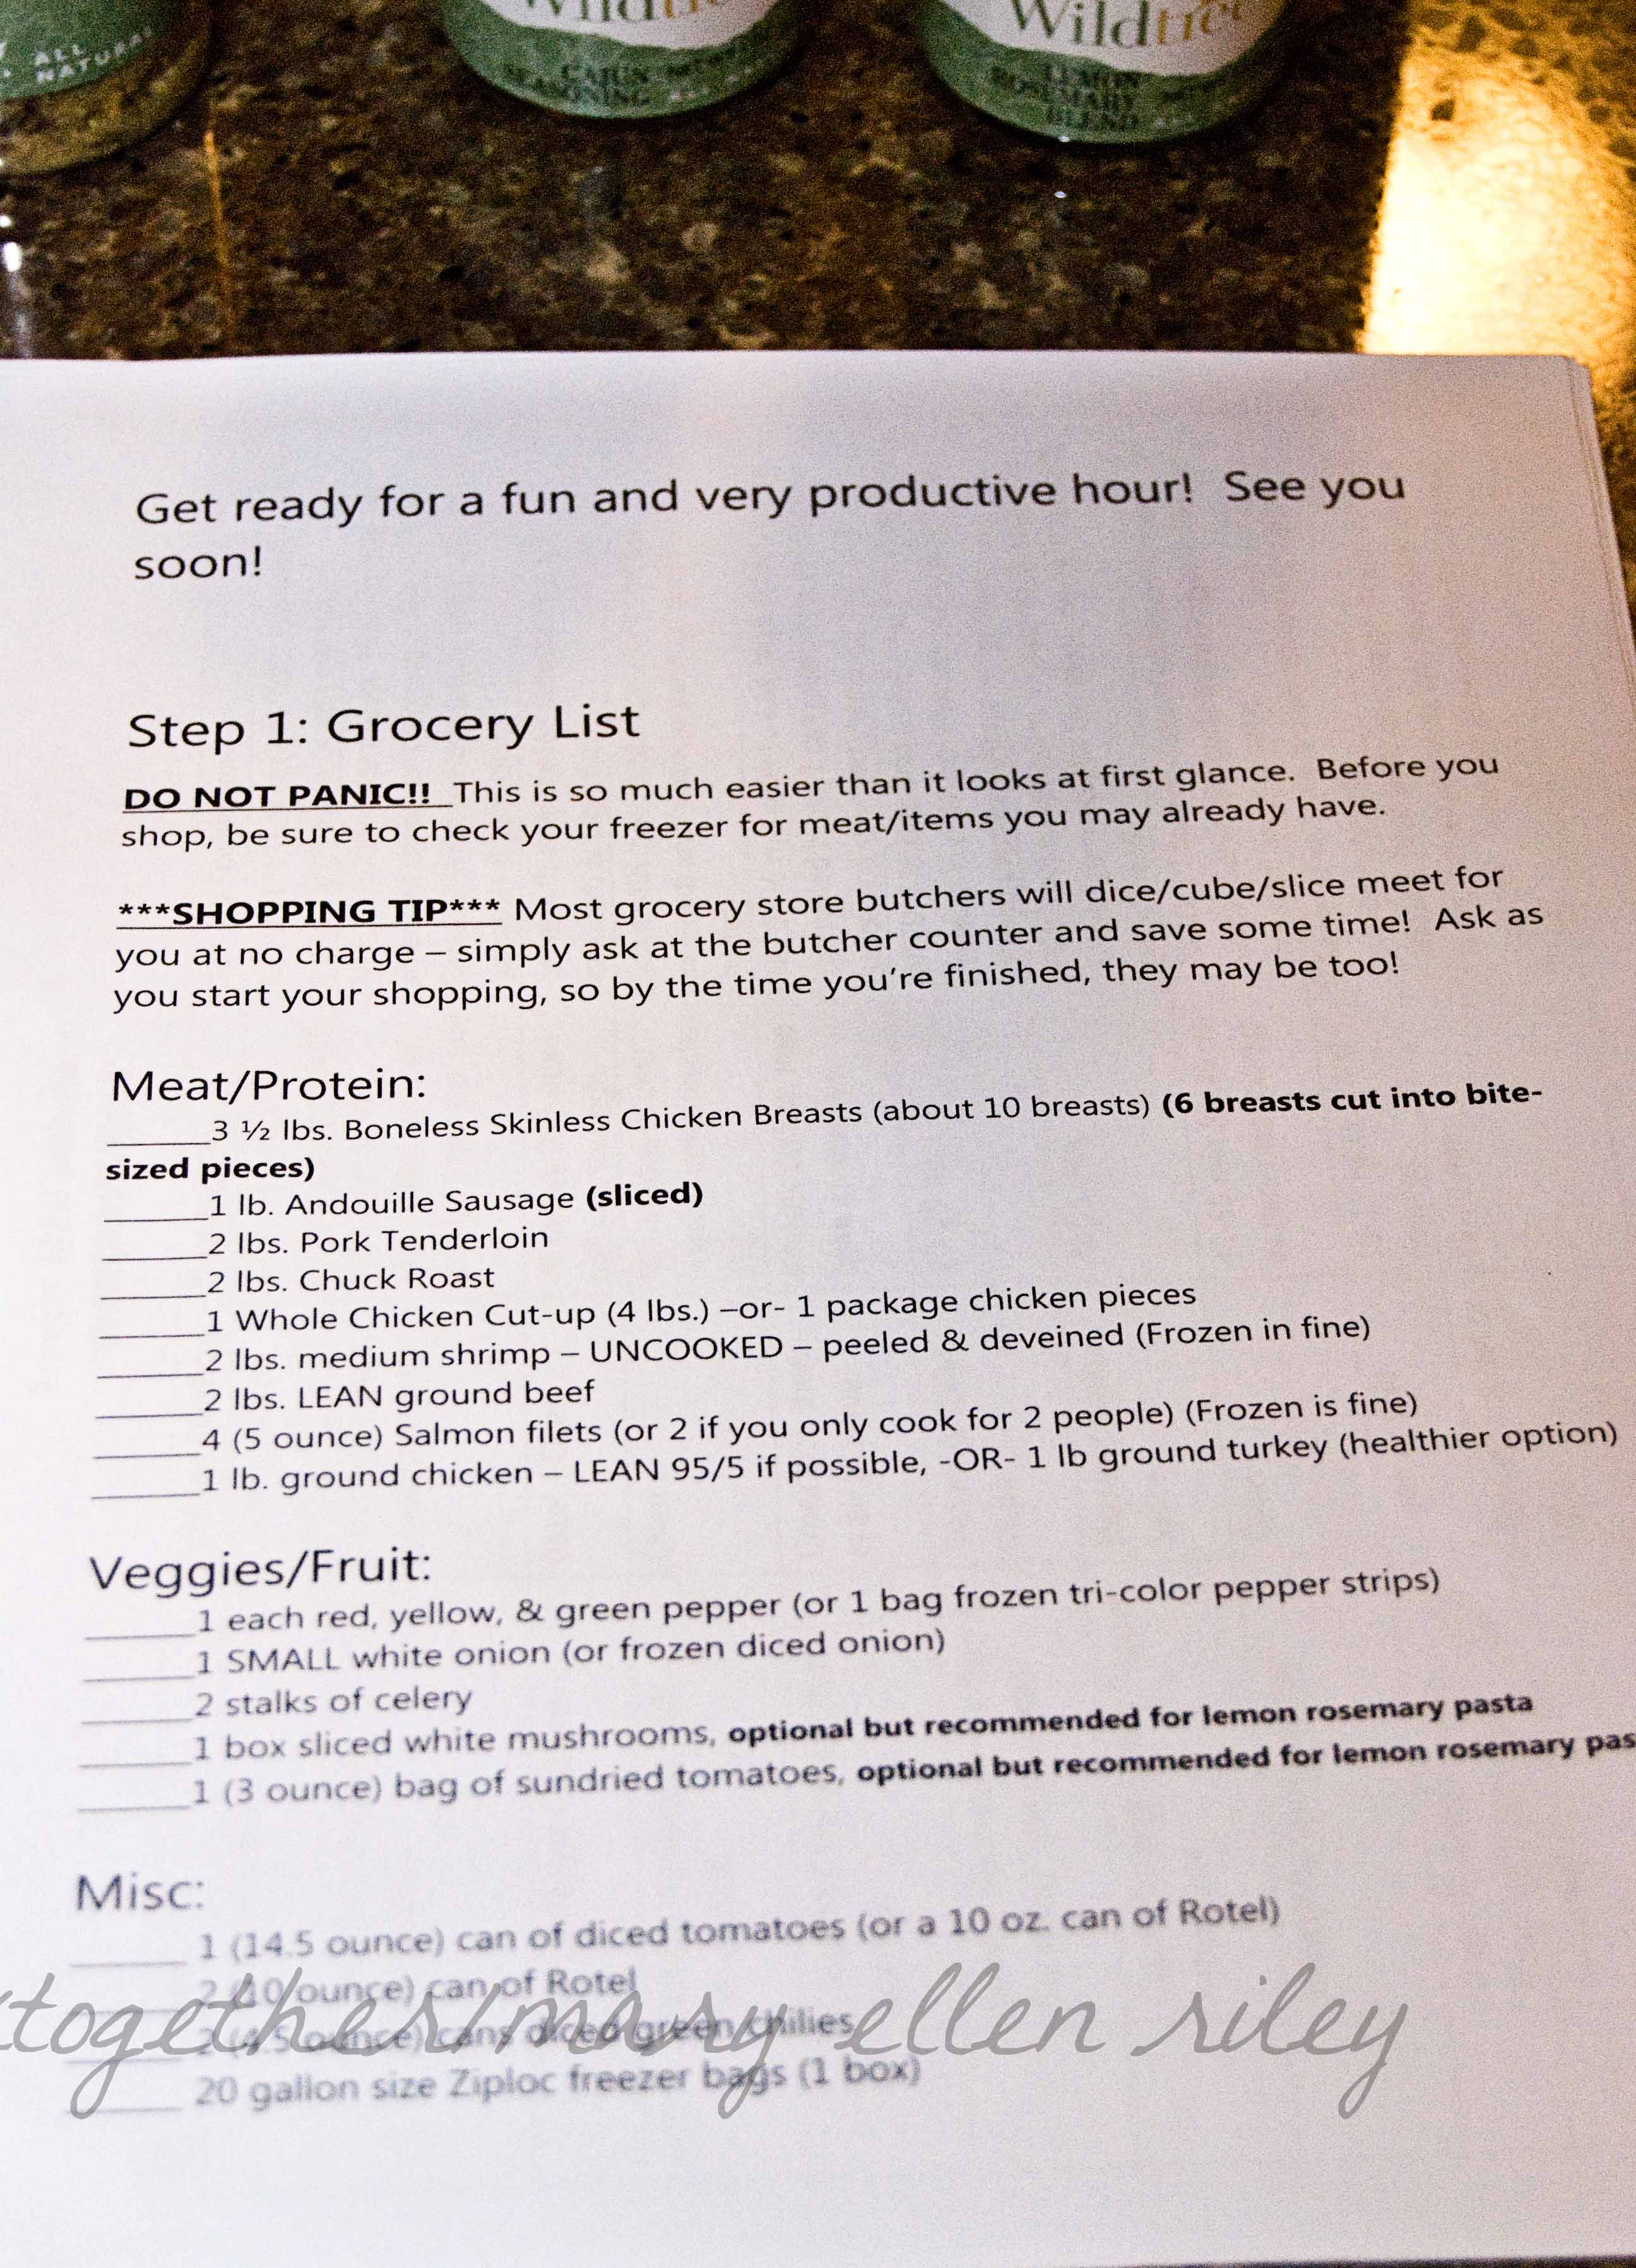 Wildtree Everyday Freezer Meal Workshop_3 on Whisk TOgether